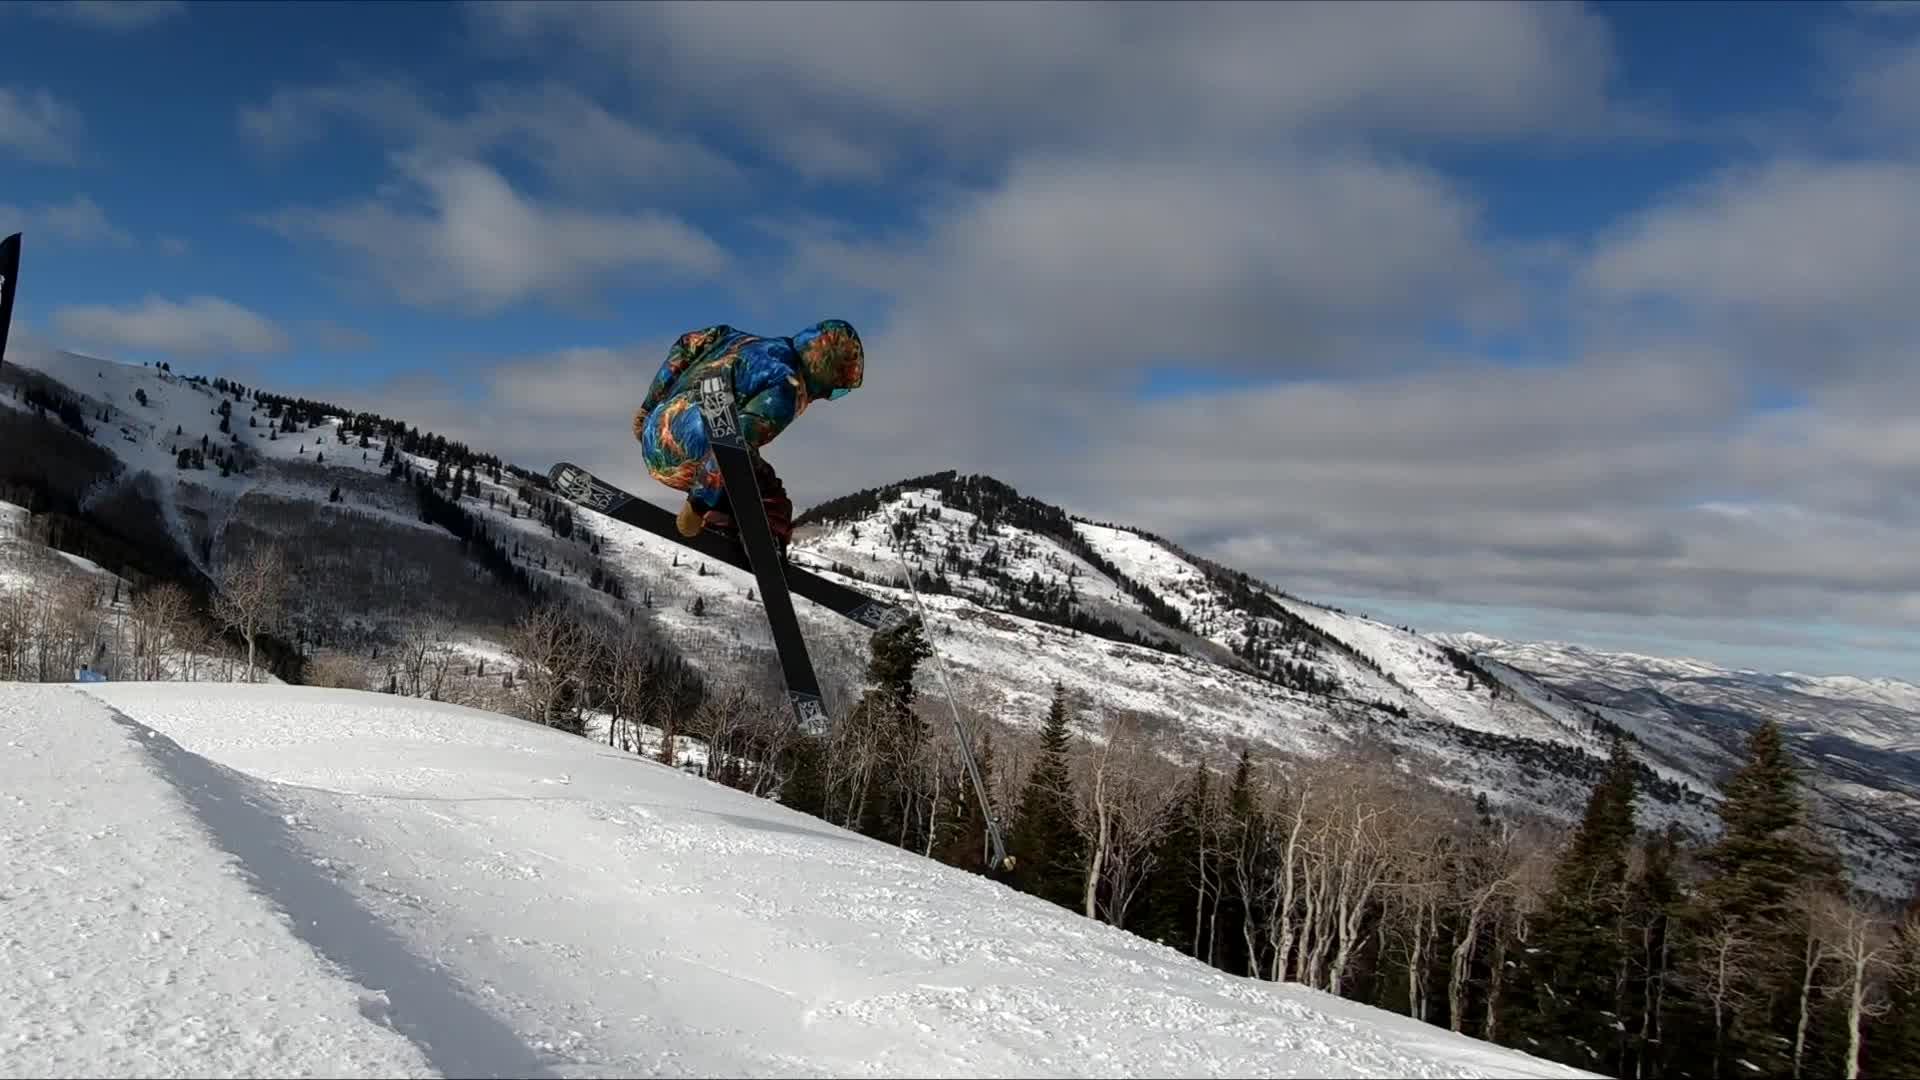 snowboard, snowboarding, sports, Snowboarding GIFs